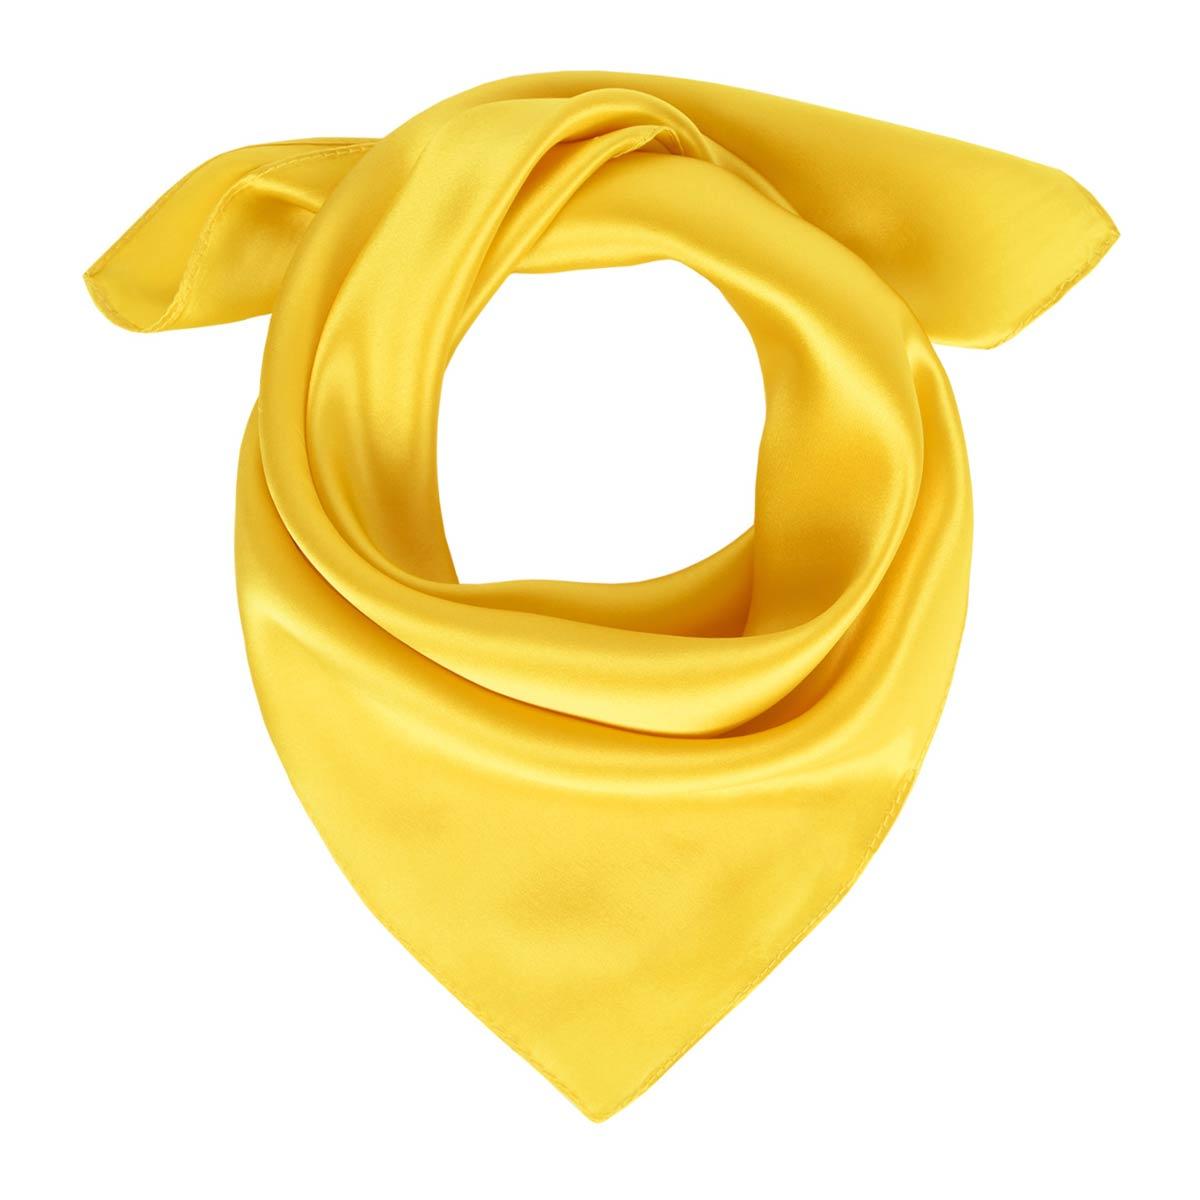 _Petit-carre-de-soie-jaune